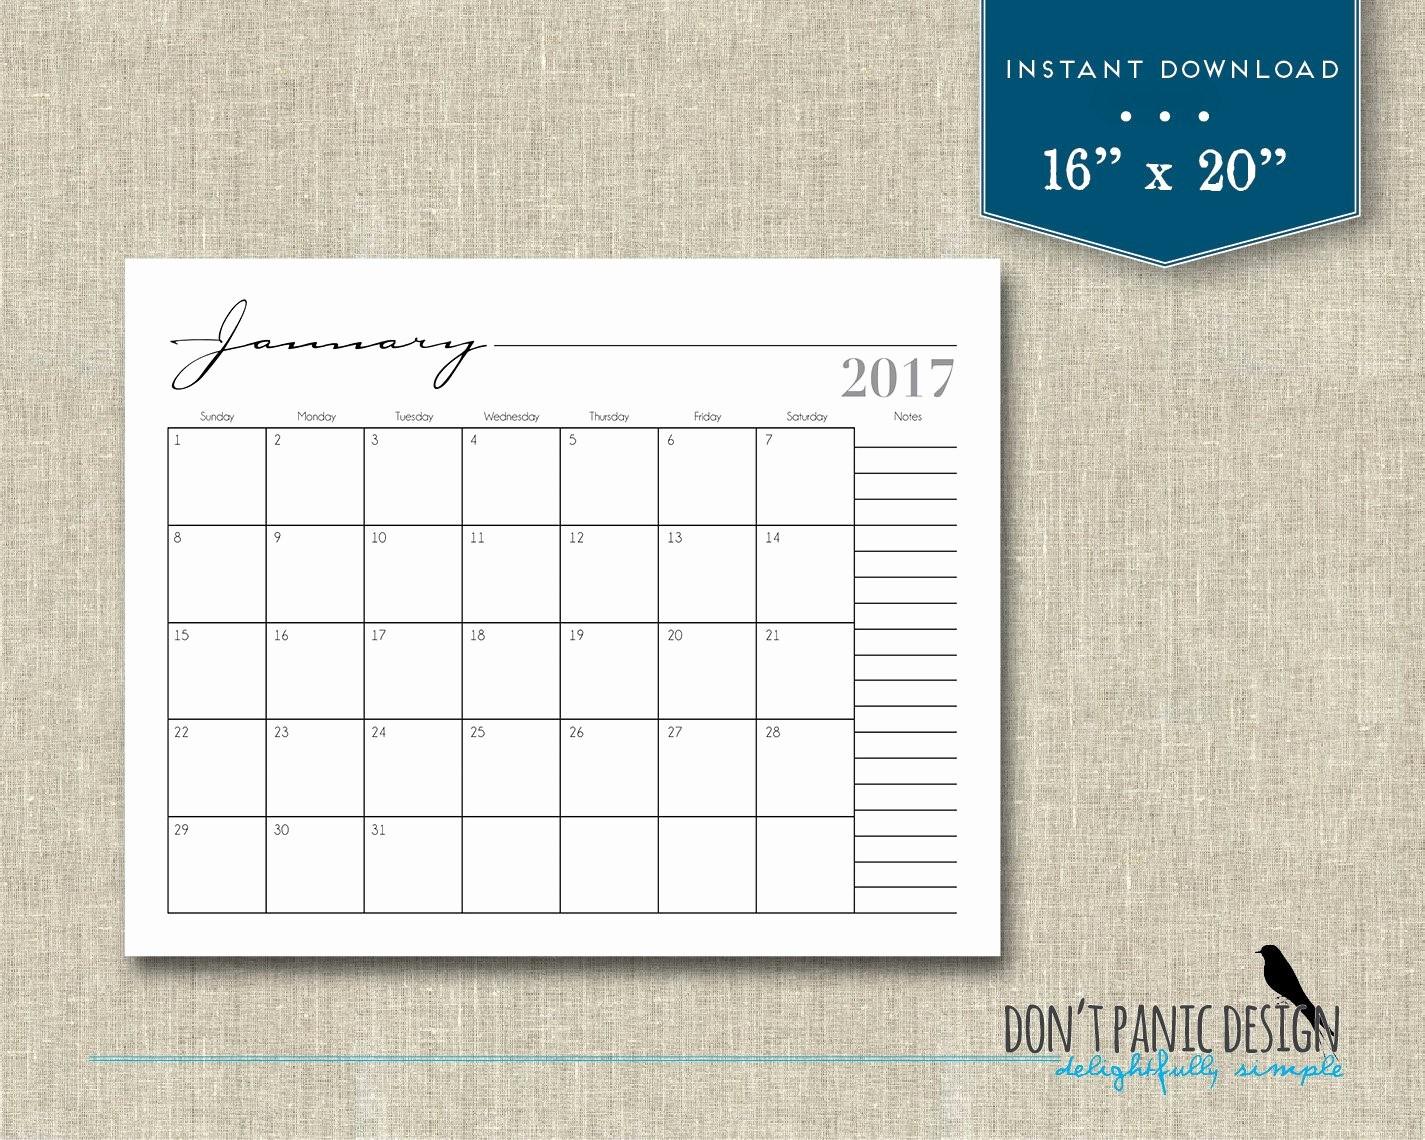 2017 12 Month Calendar Printable Fresh 2017 Printable 12 Month Wall Calendar 16 X